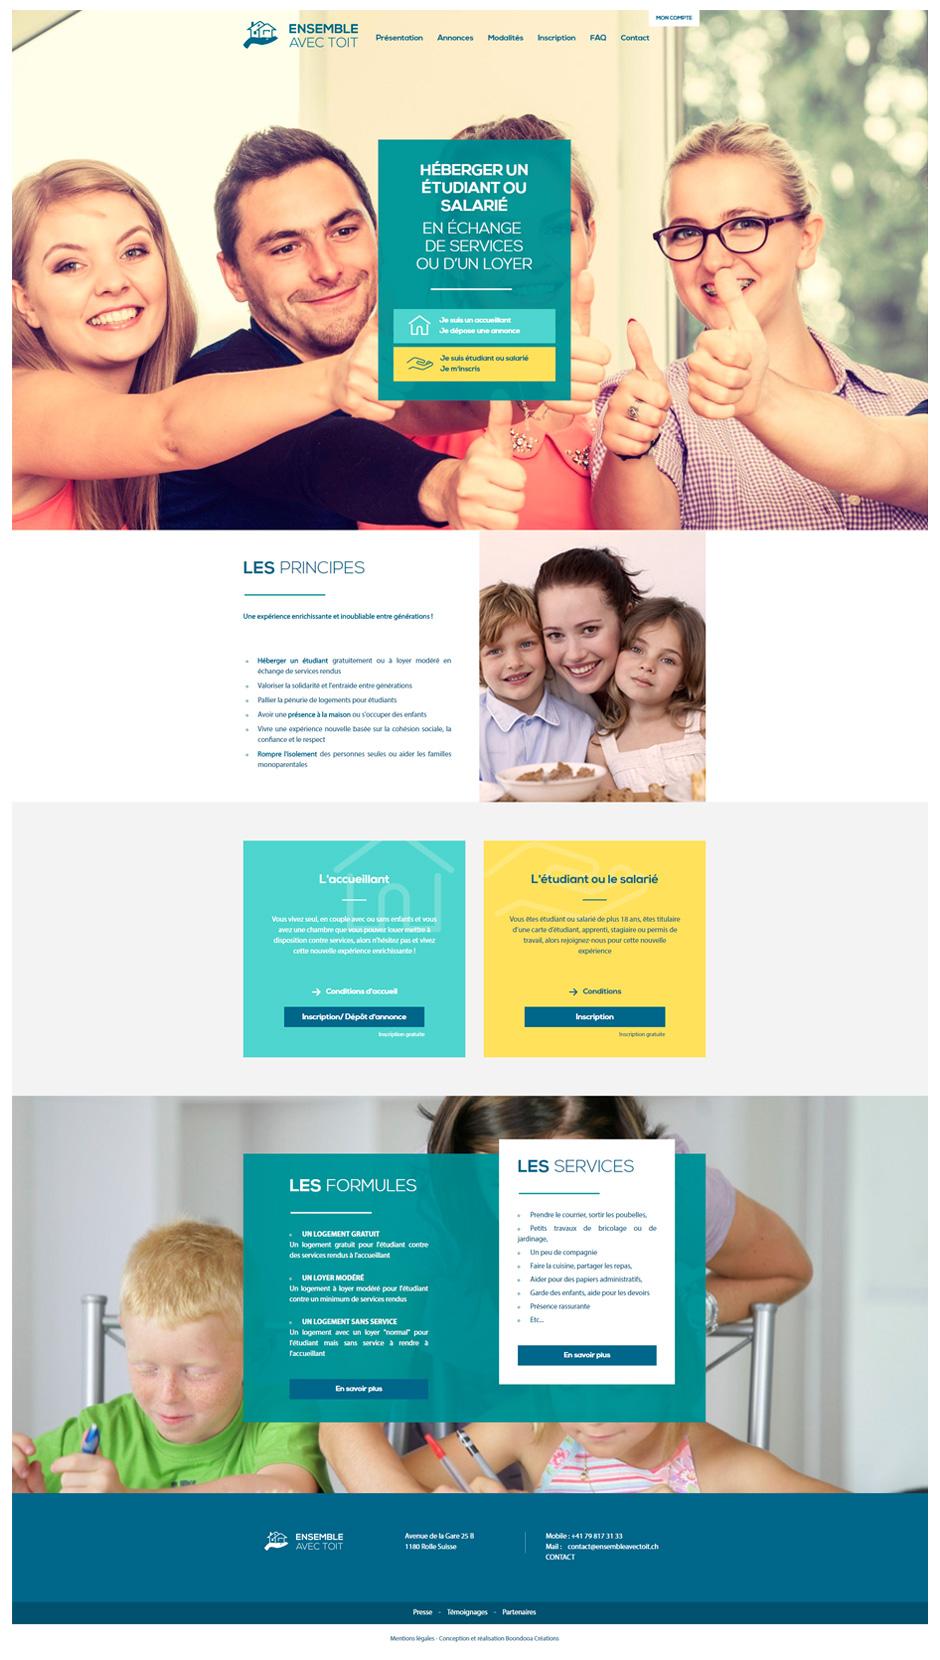 Homepage site Ensemble avec toit